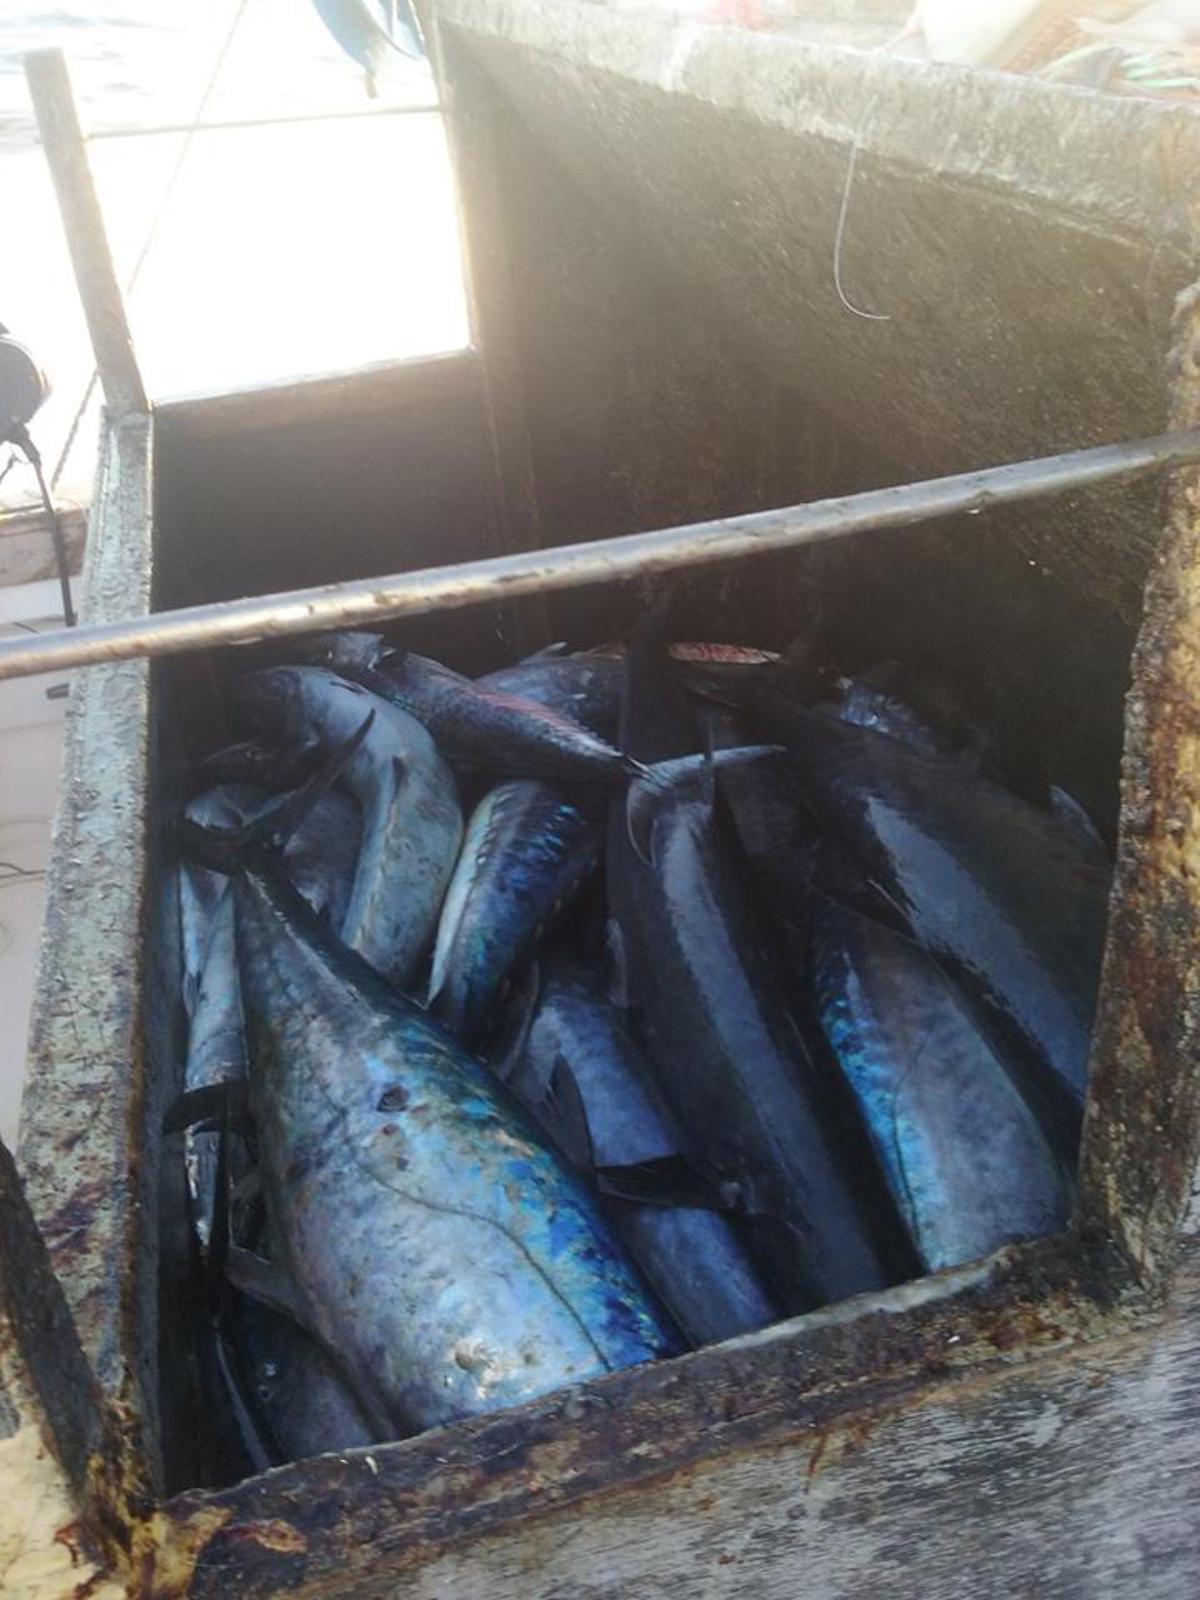 10/29/2016 Hatteras Fishing Report